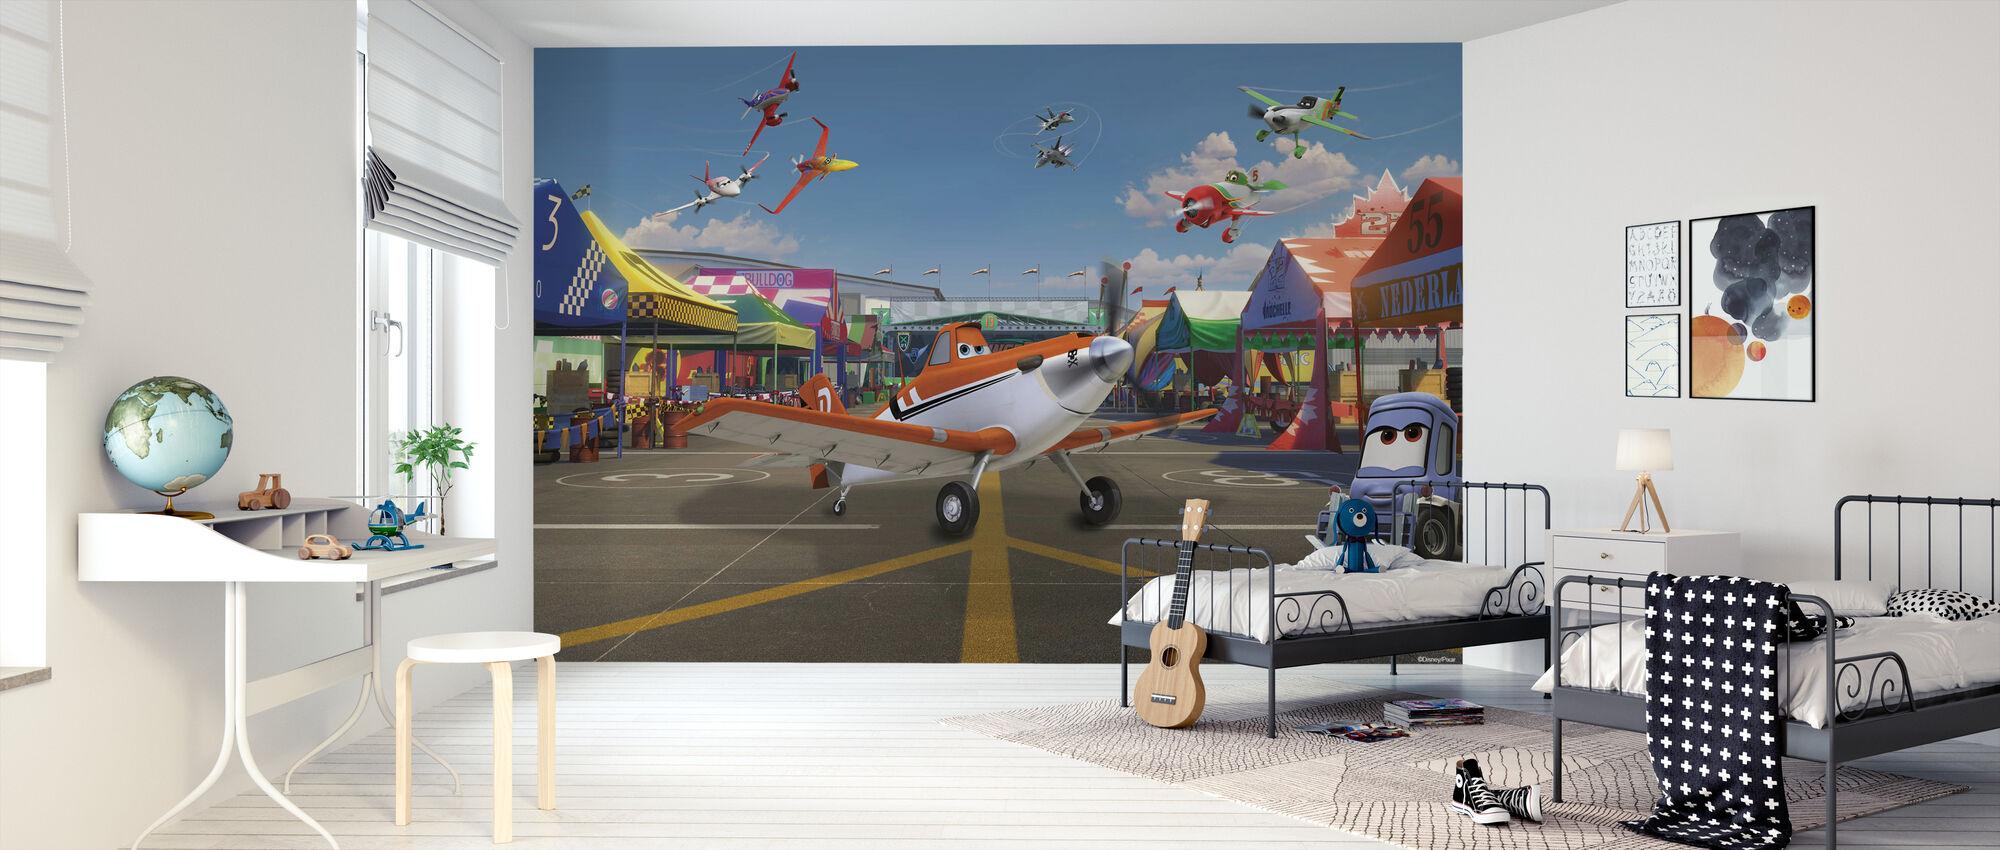 Fly - Støvete på flyvningshow - Tapet - Barnerom